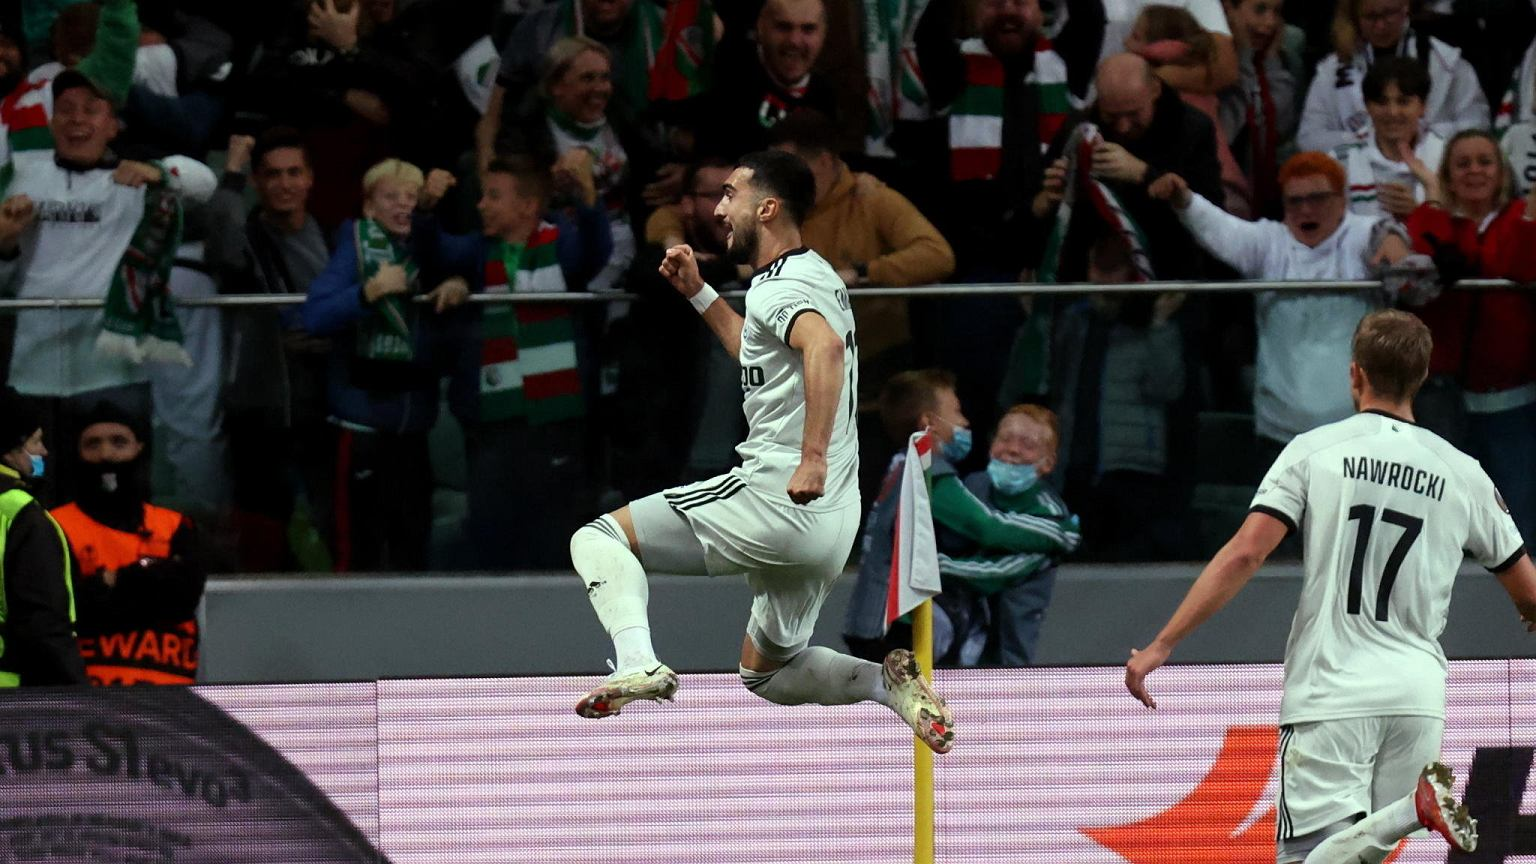 Maher Emreli scored 1-0 against Leicester City